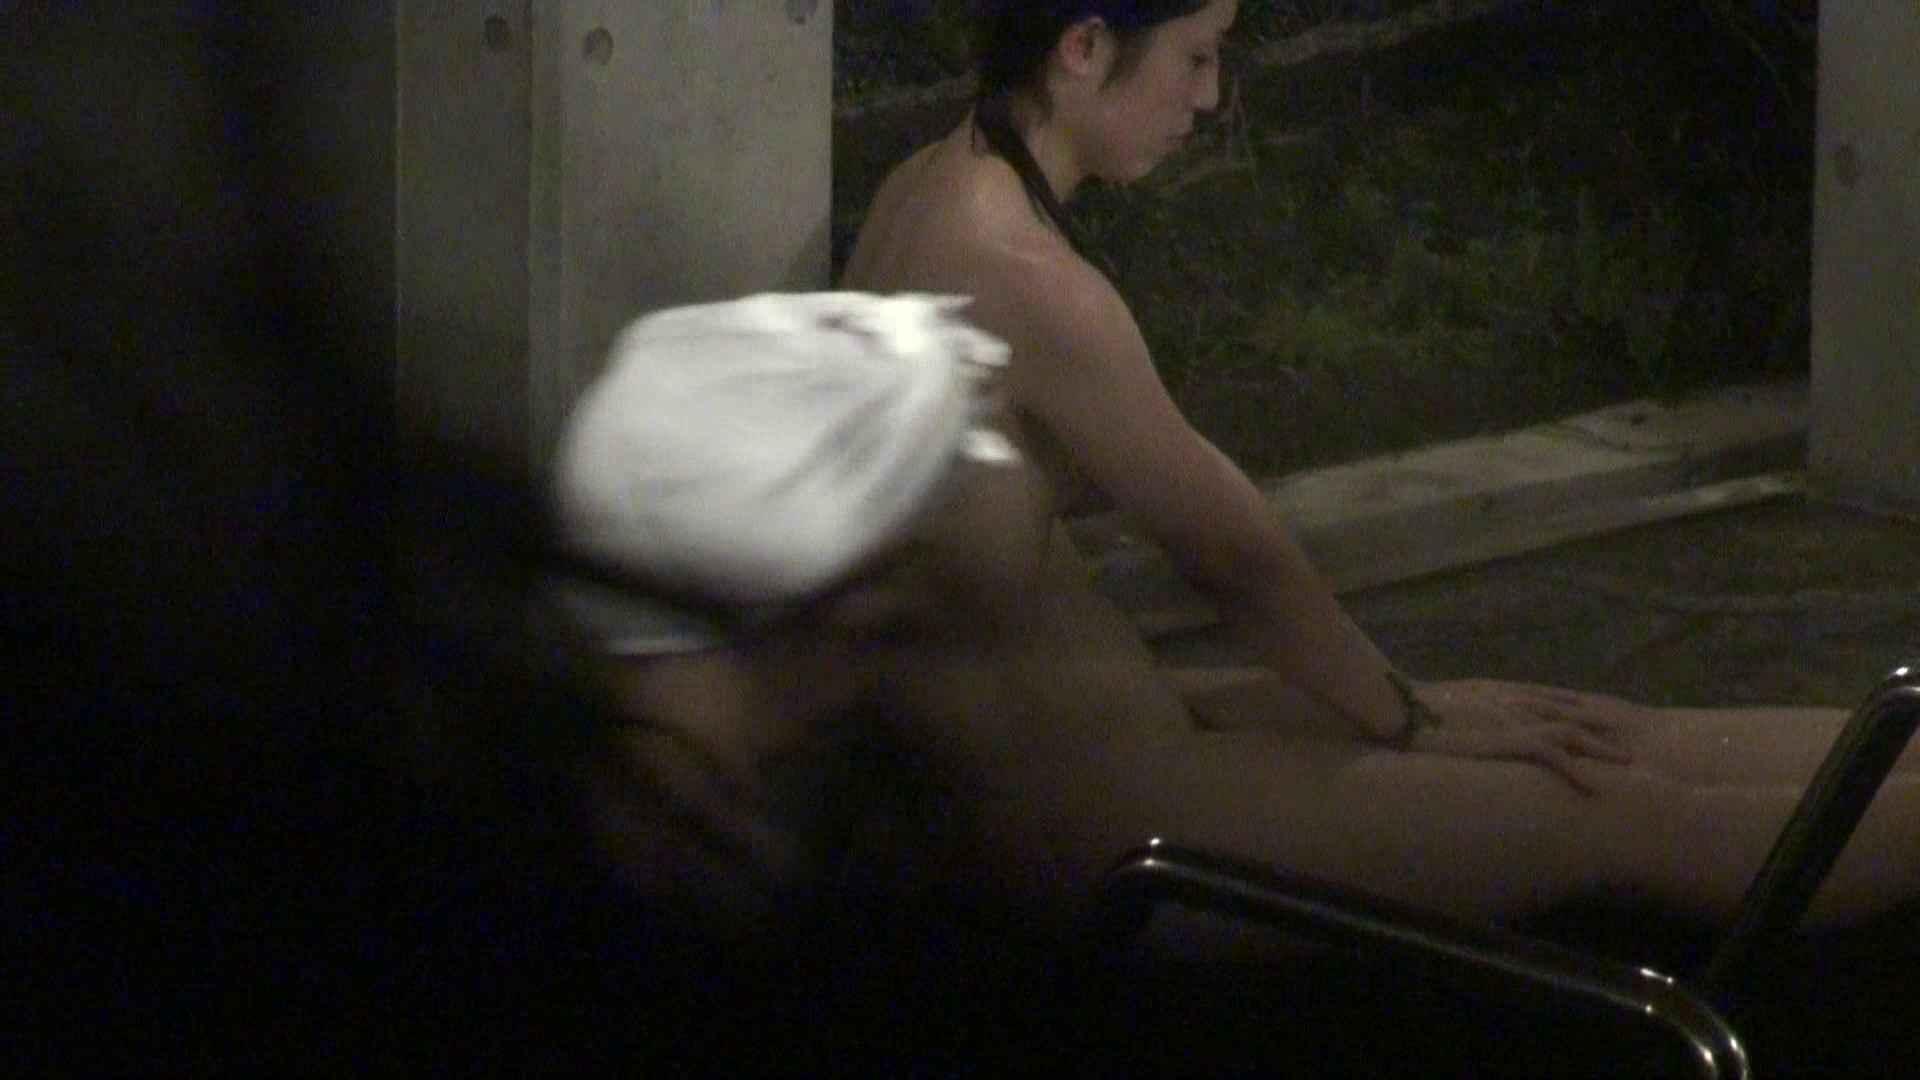 Aquaな露天風呂Vol.344 いやらしいOL セックス画像 75連発 72